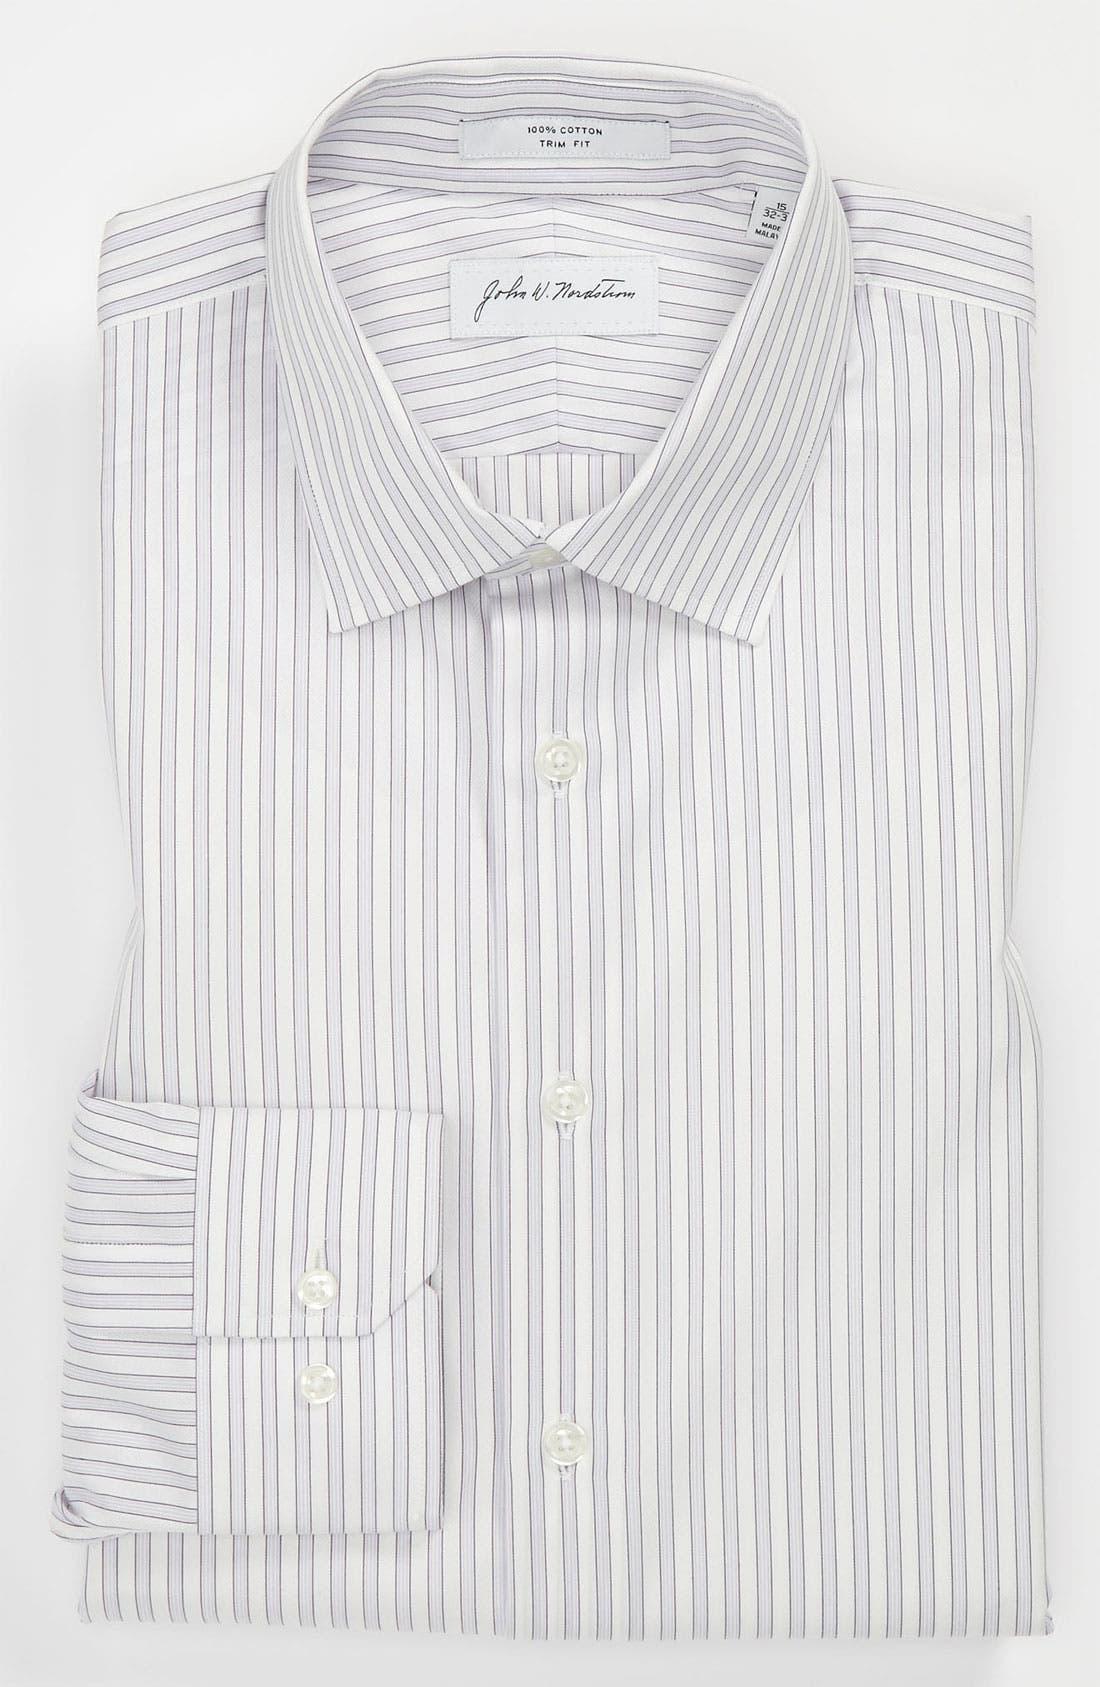 Alternate Image 1 Selected - John W. Nordstrom Trim Fit Dress Shirt